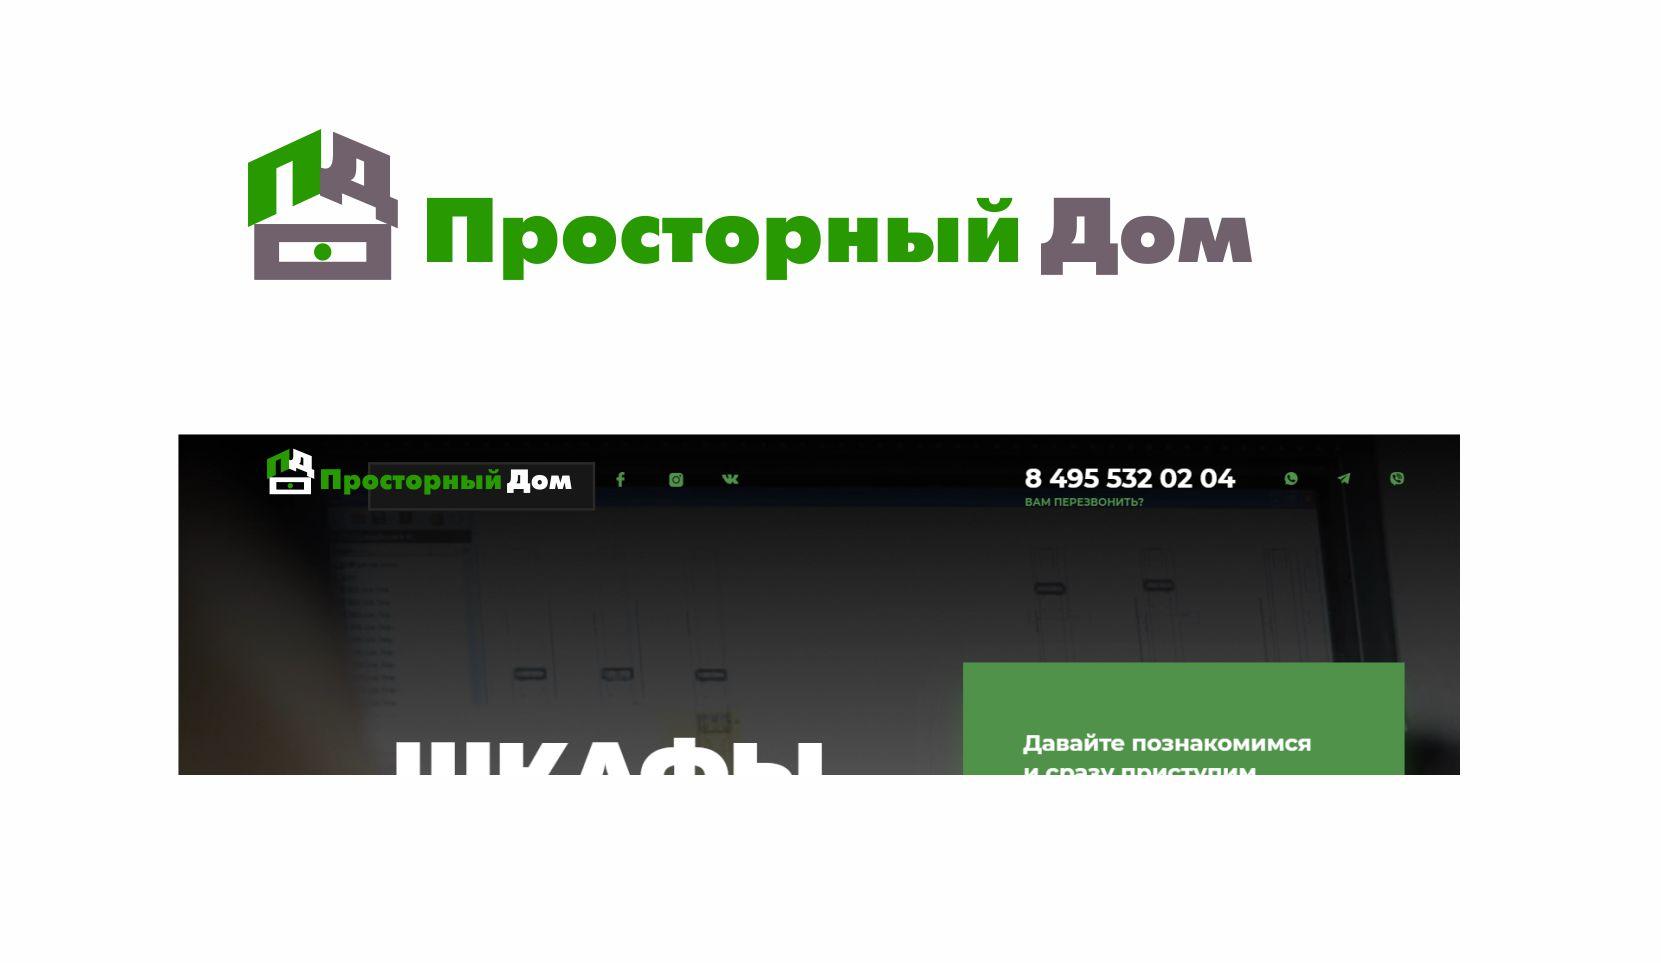 Логотип и фирменный стиль для компании по шкафам-купе фото f_5735b6a909e3b360.jpg